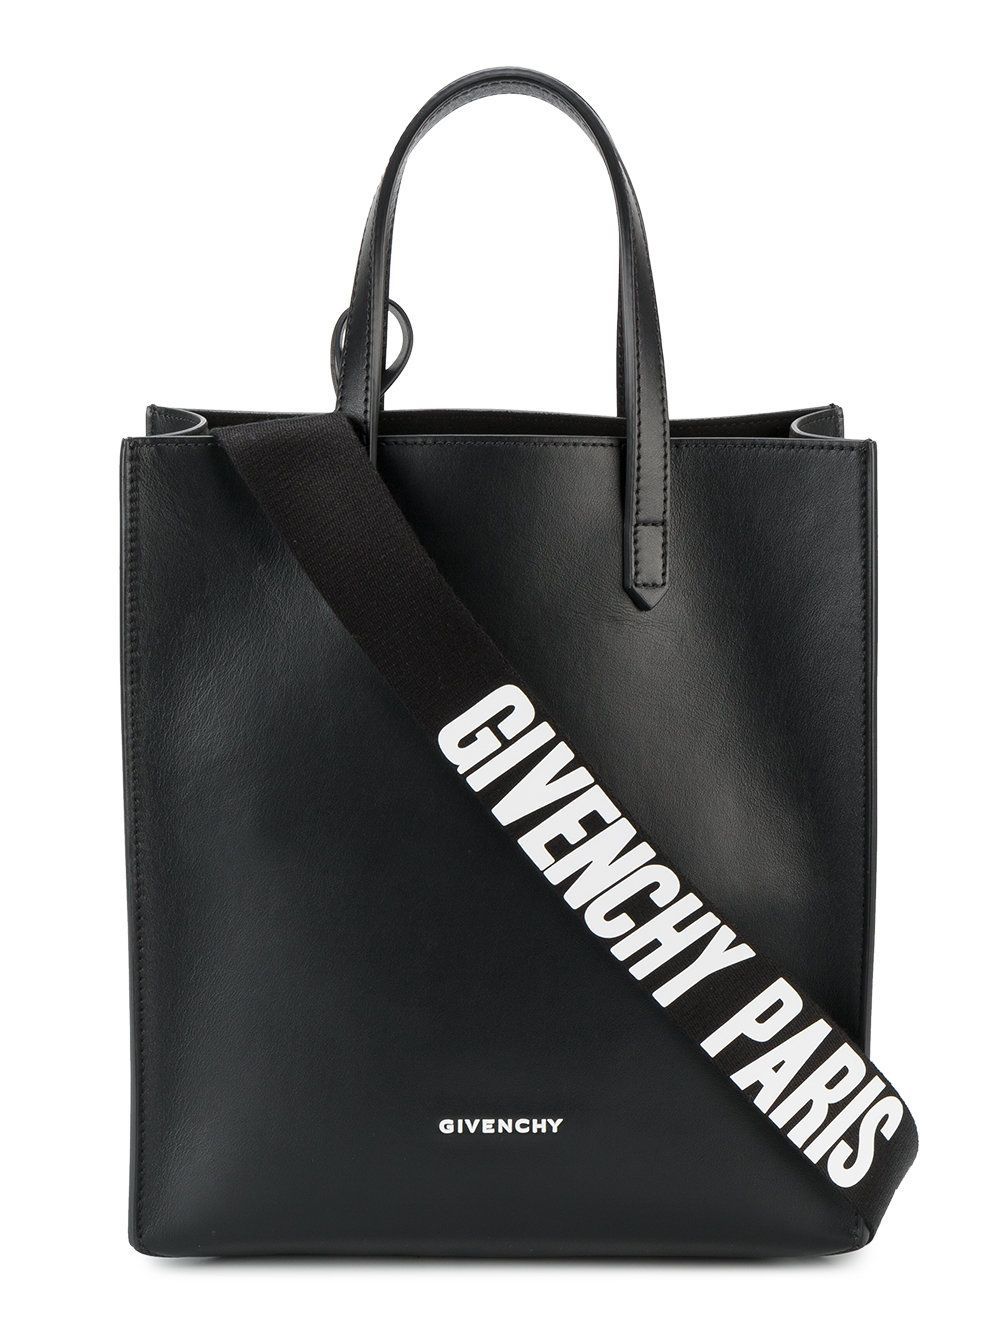 fca11d4b30  givenchy  bags  tote  stargate  logo  strap  shopper  newin www.jofre.eu